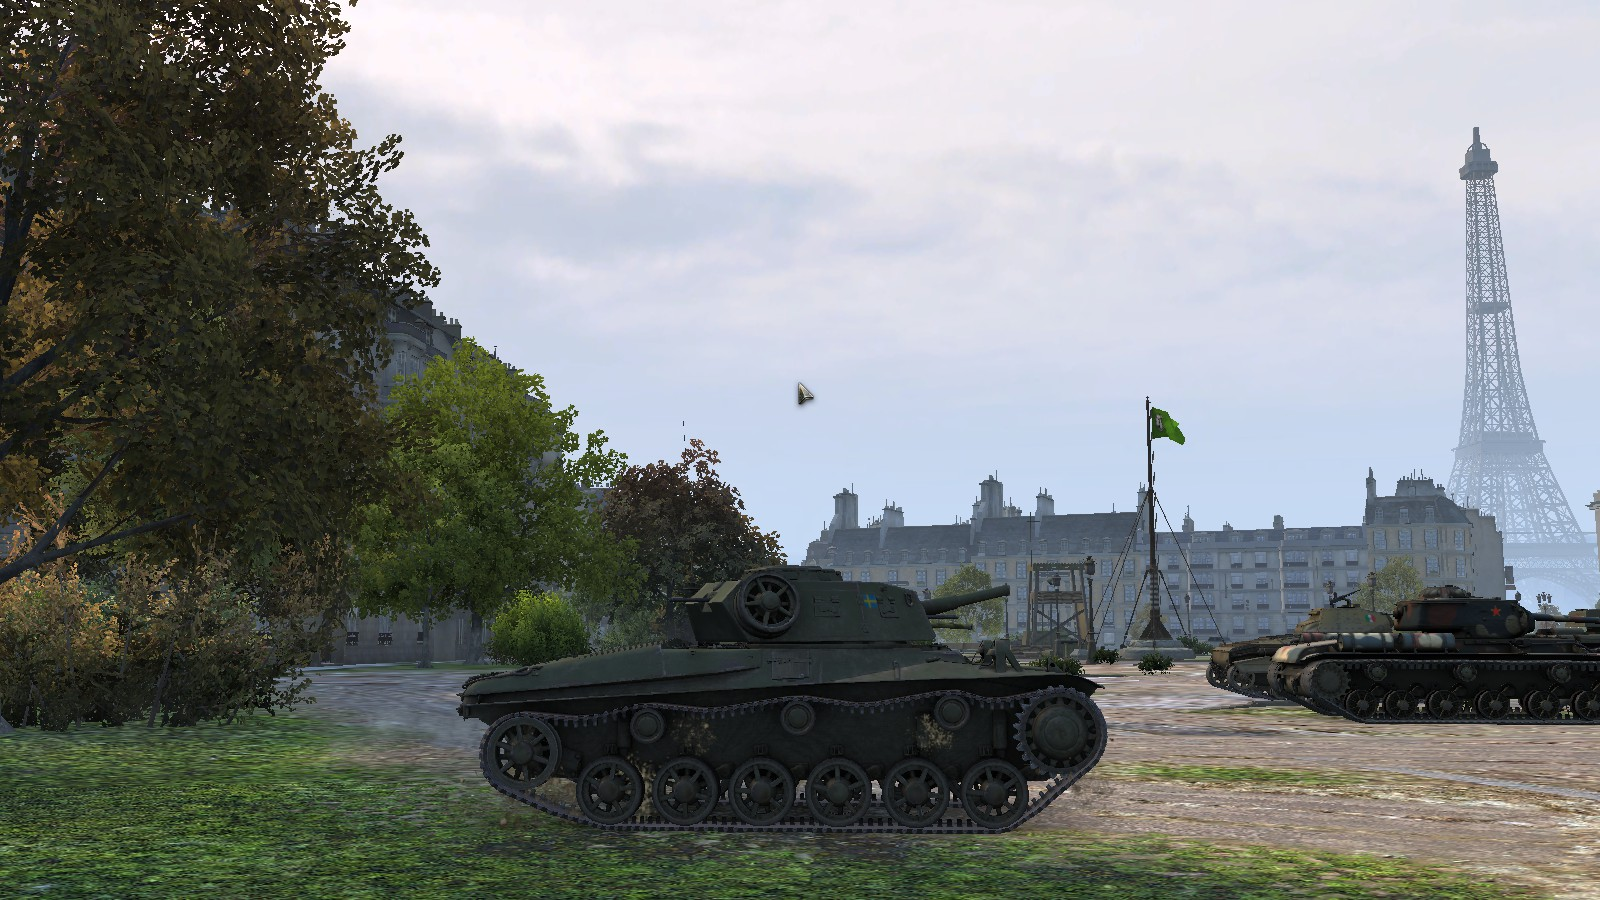 World of Tanks Screenshot 2019.01.12 - 20.13.19.97.jpg - World of Tanks